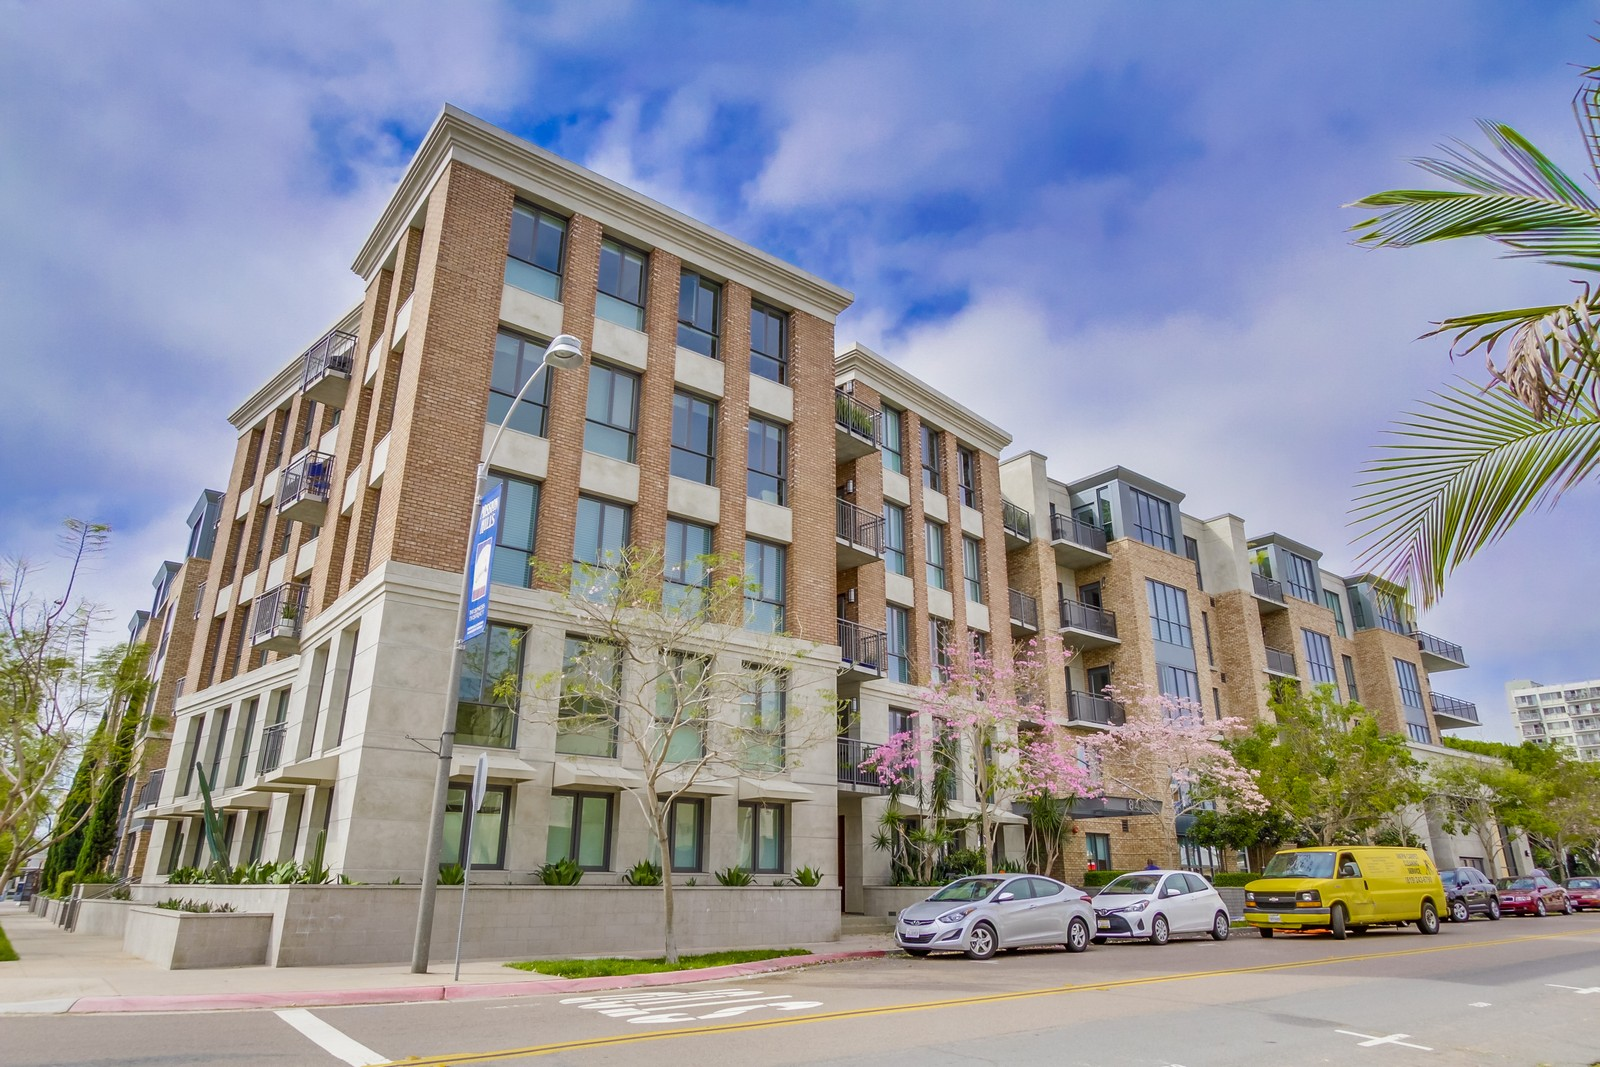 Condominio por un Alquiler en 845 Fort Stockton Drive, 311 San Diego, California 92103 Estados Unidos